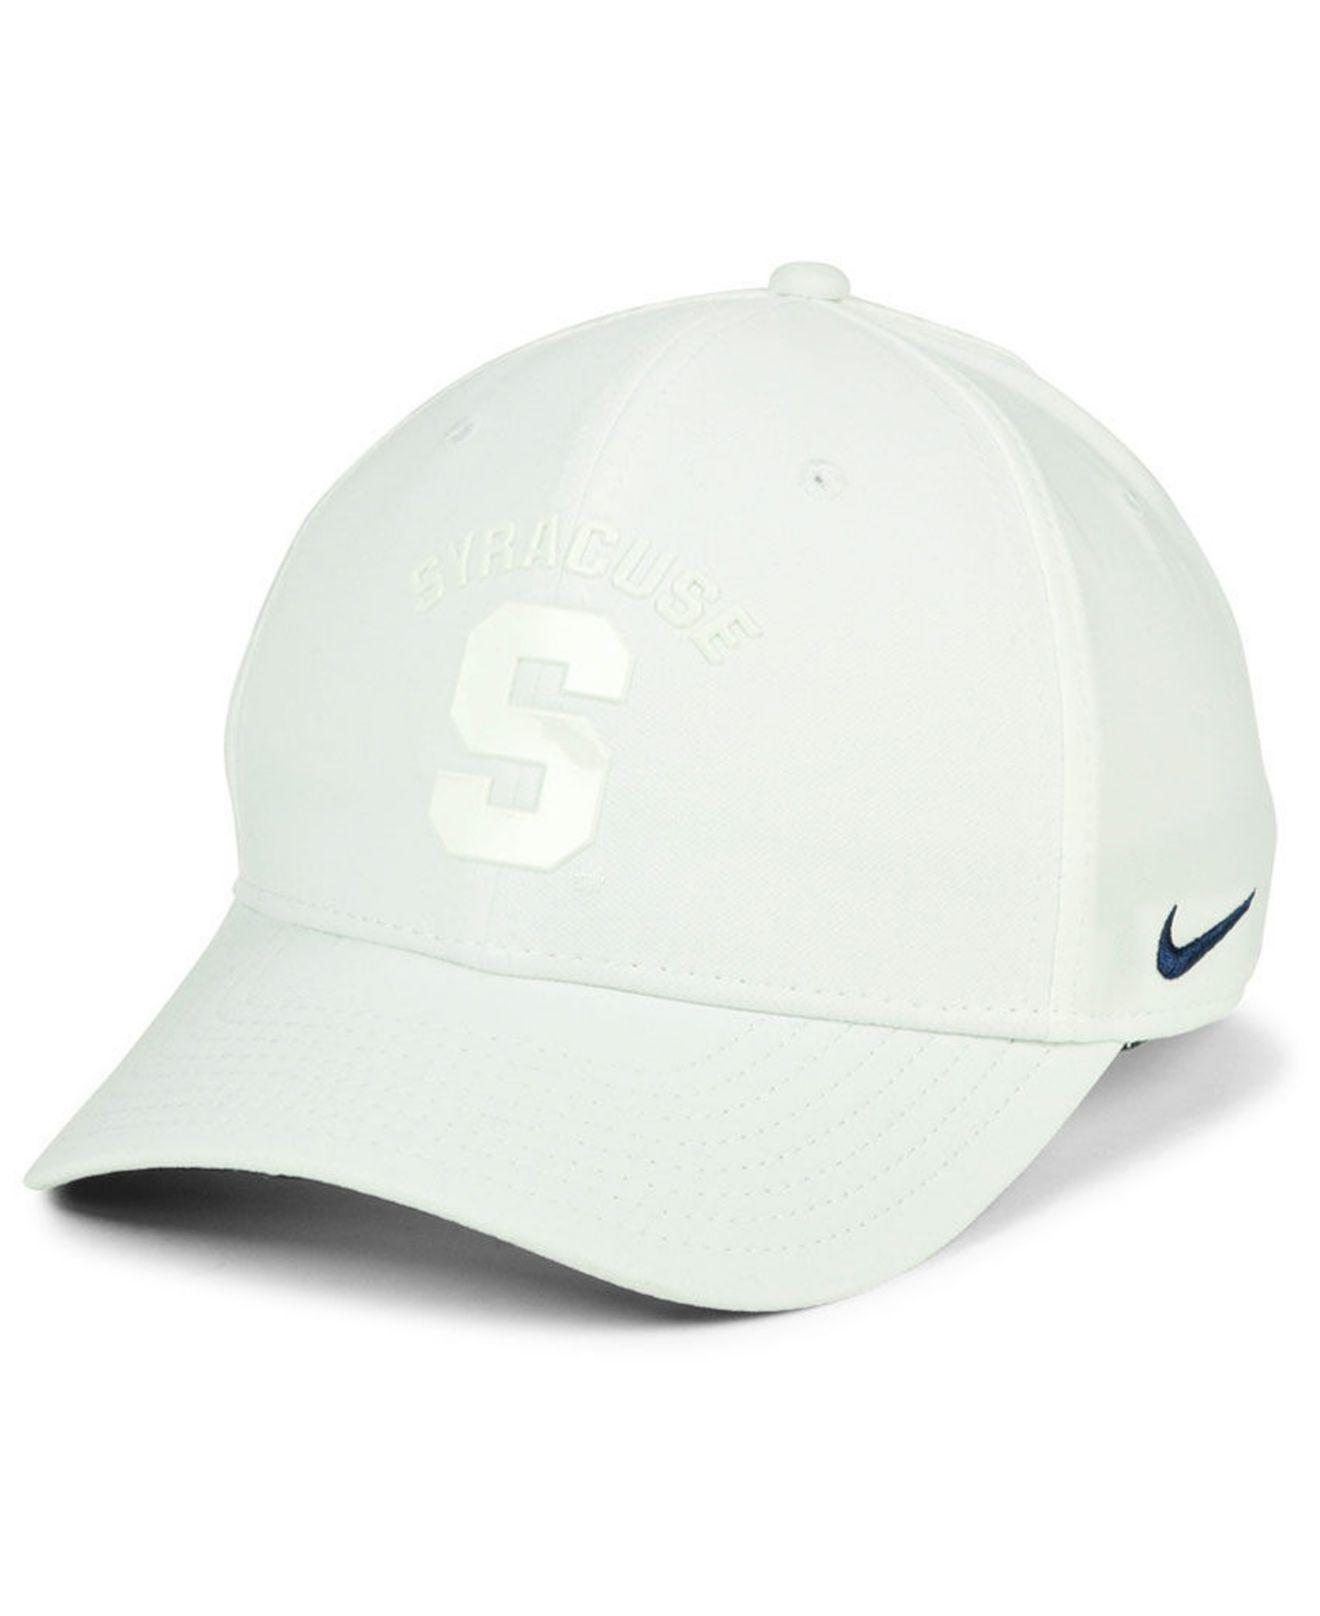 on sale 79527 a873e usa lyst nike syracuse orange col cap in white for men 989a4 80388